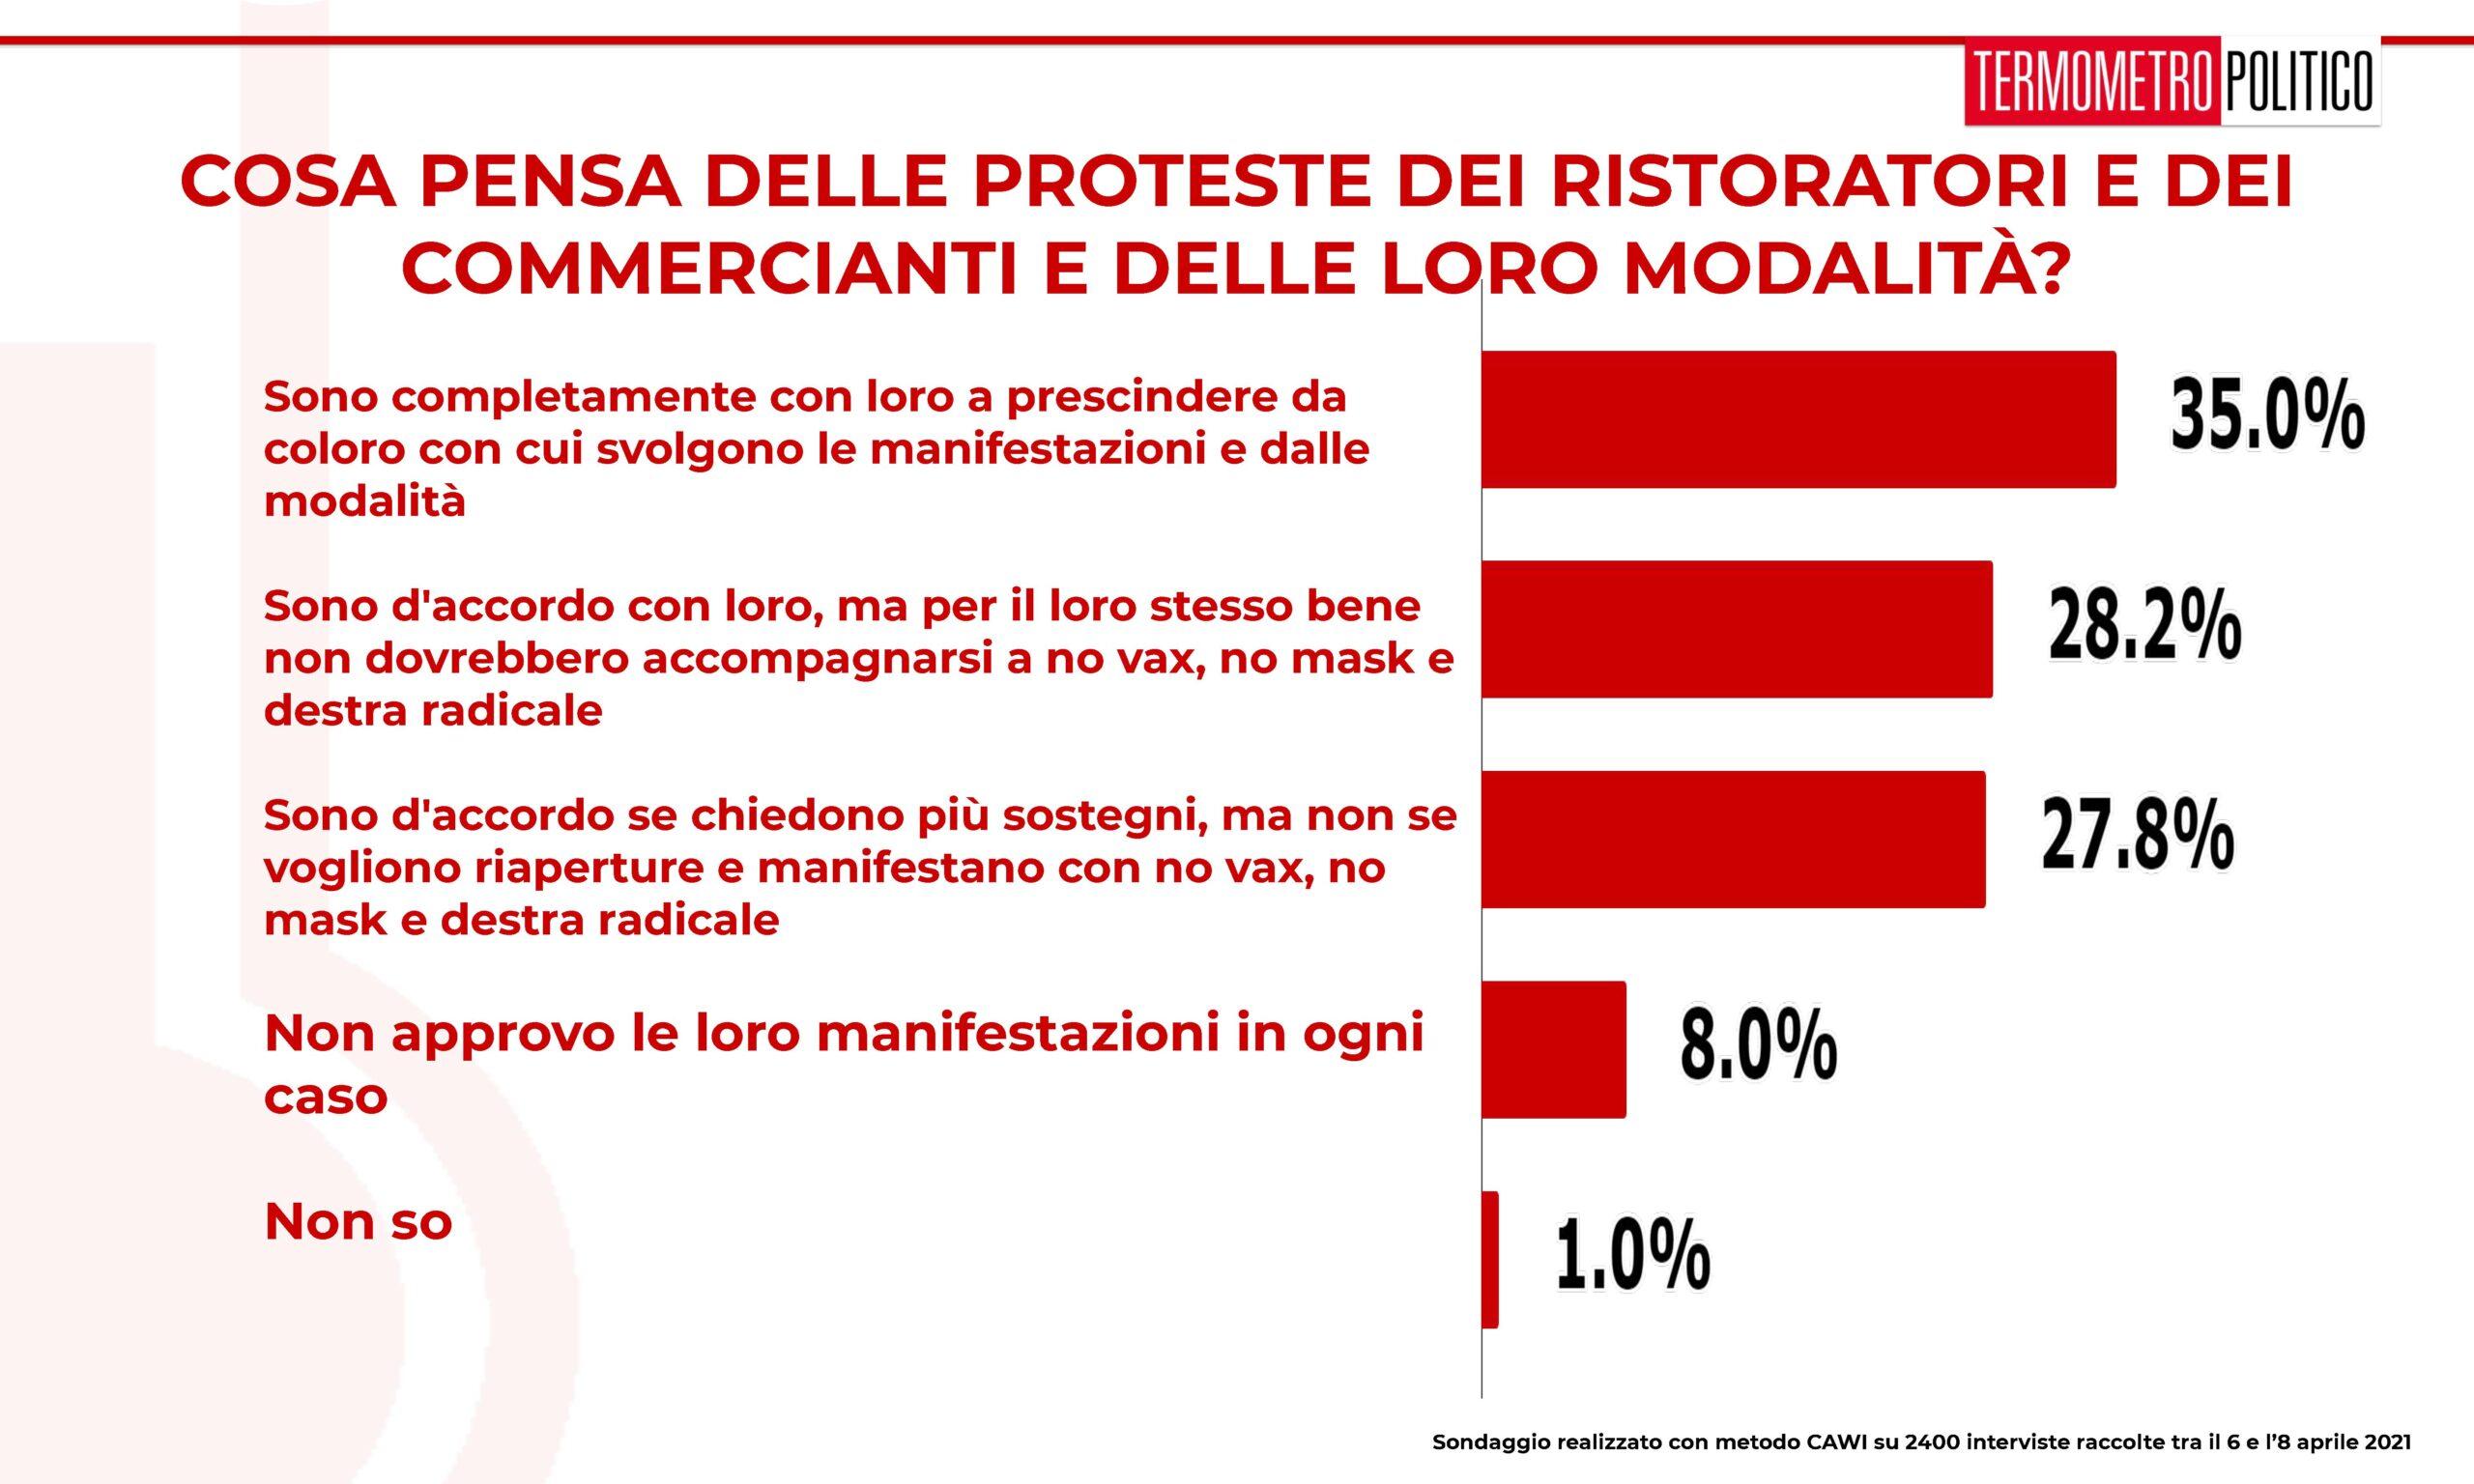 sondaggi tp, proteste ristoratori